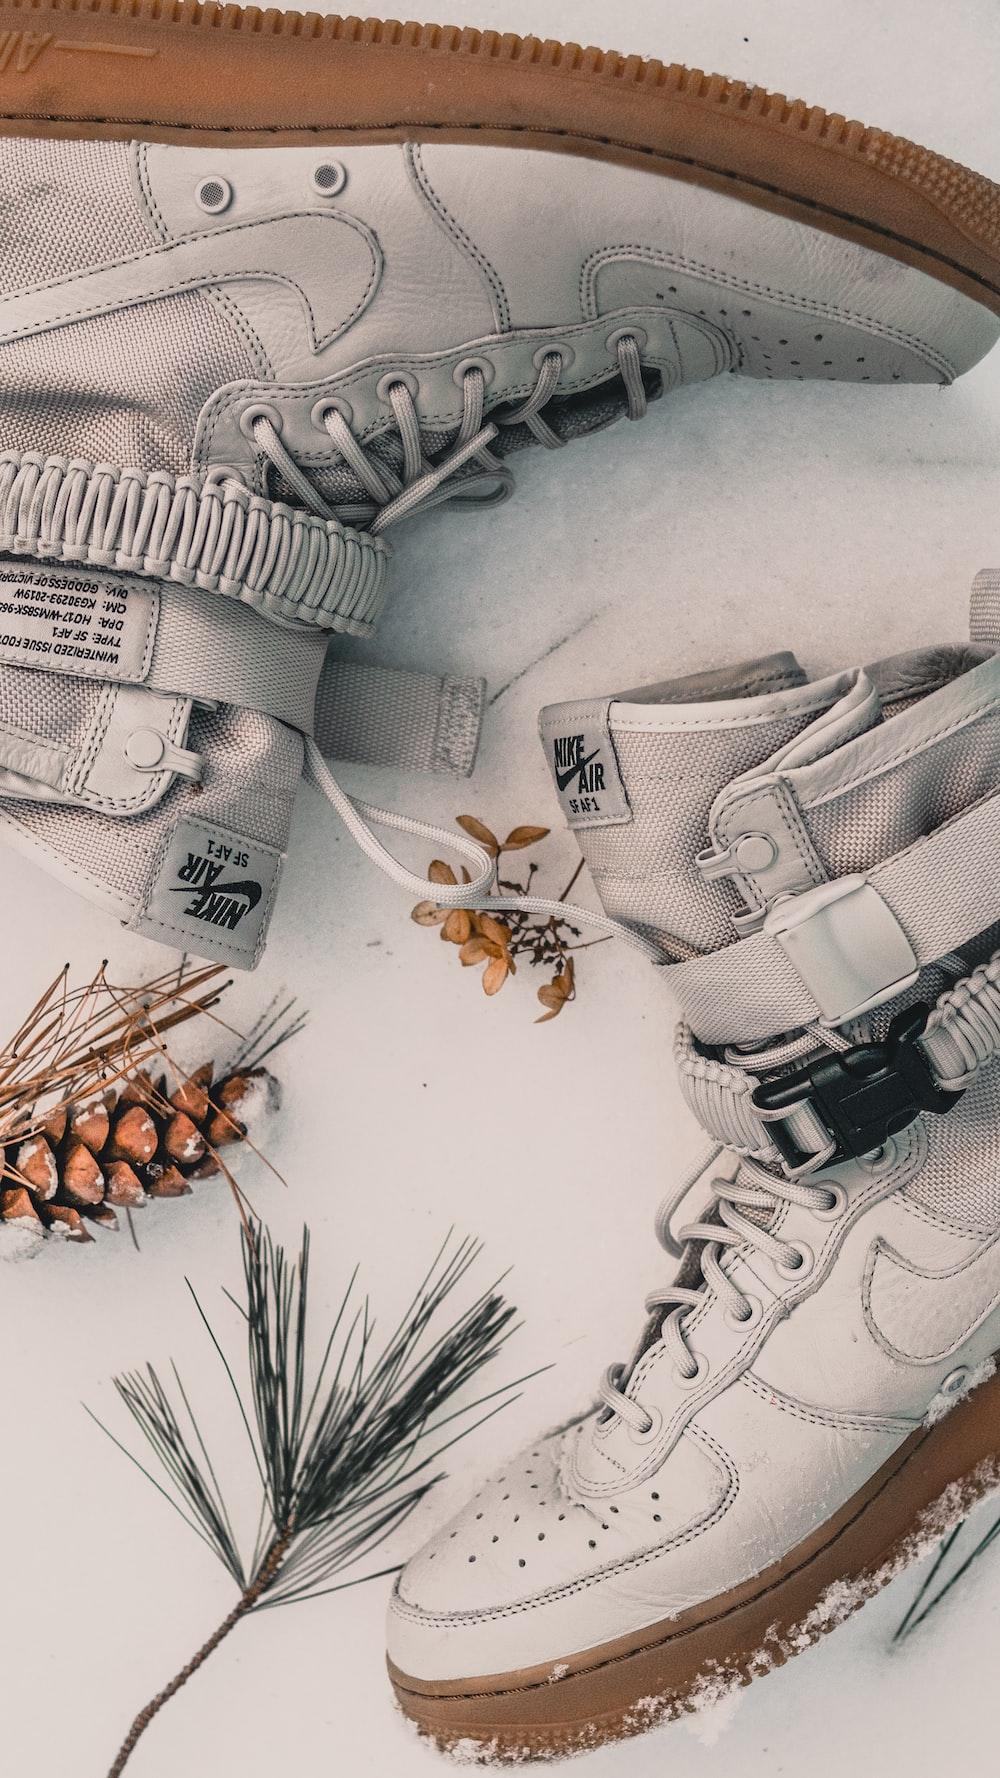 pair of white Nike Air high-top sneakers